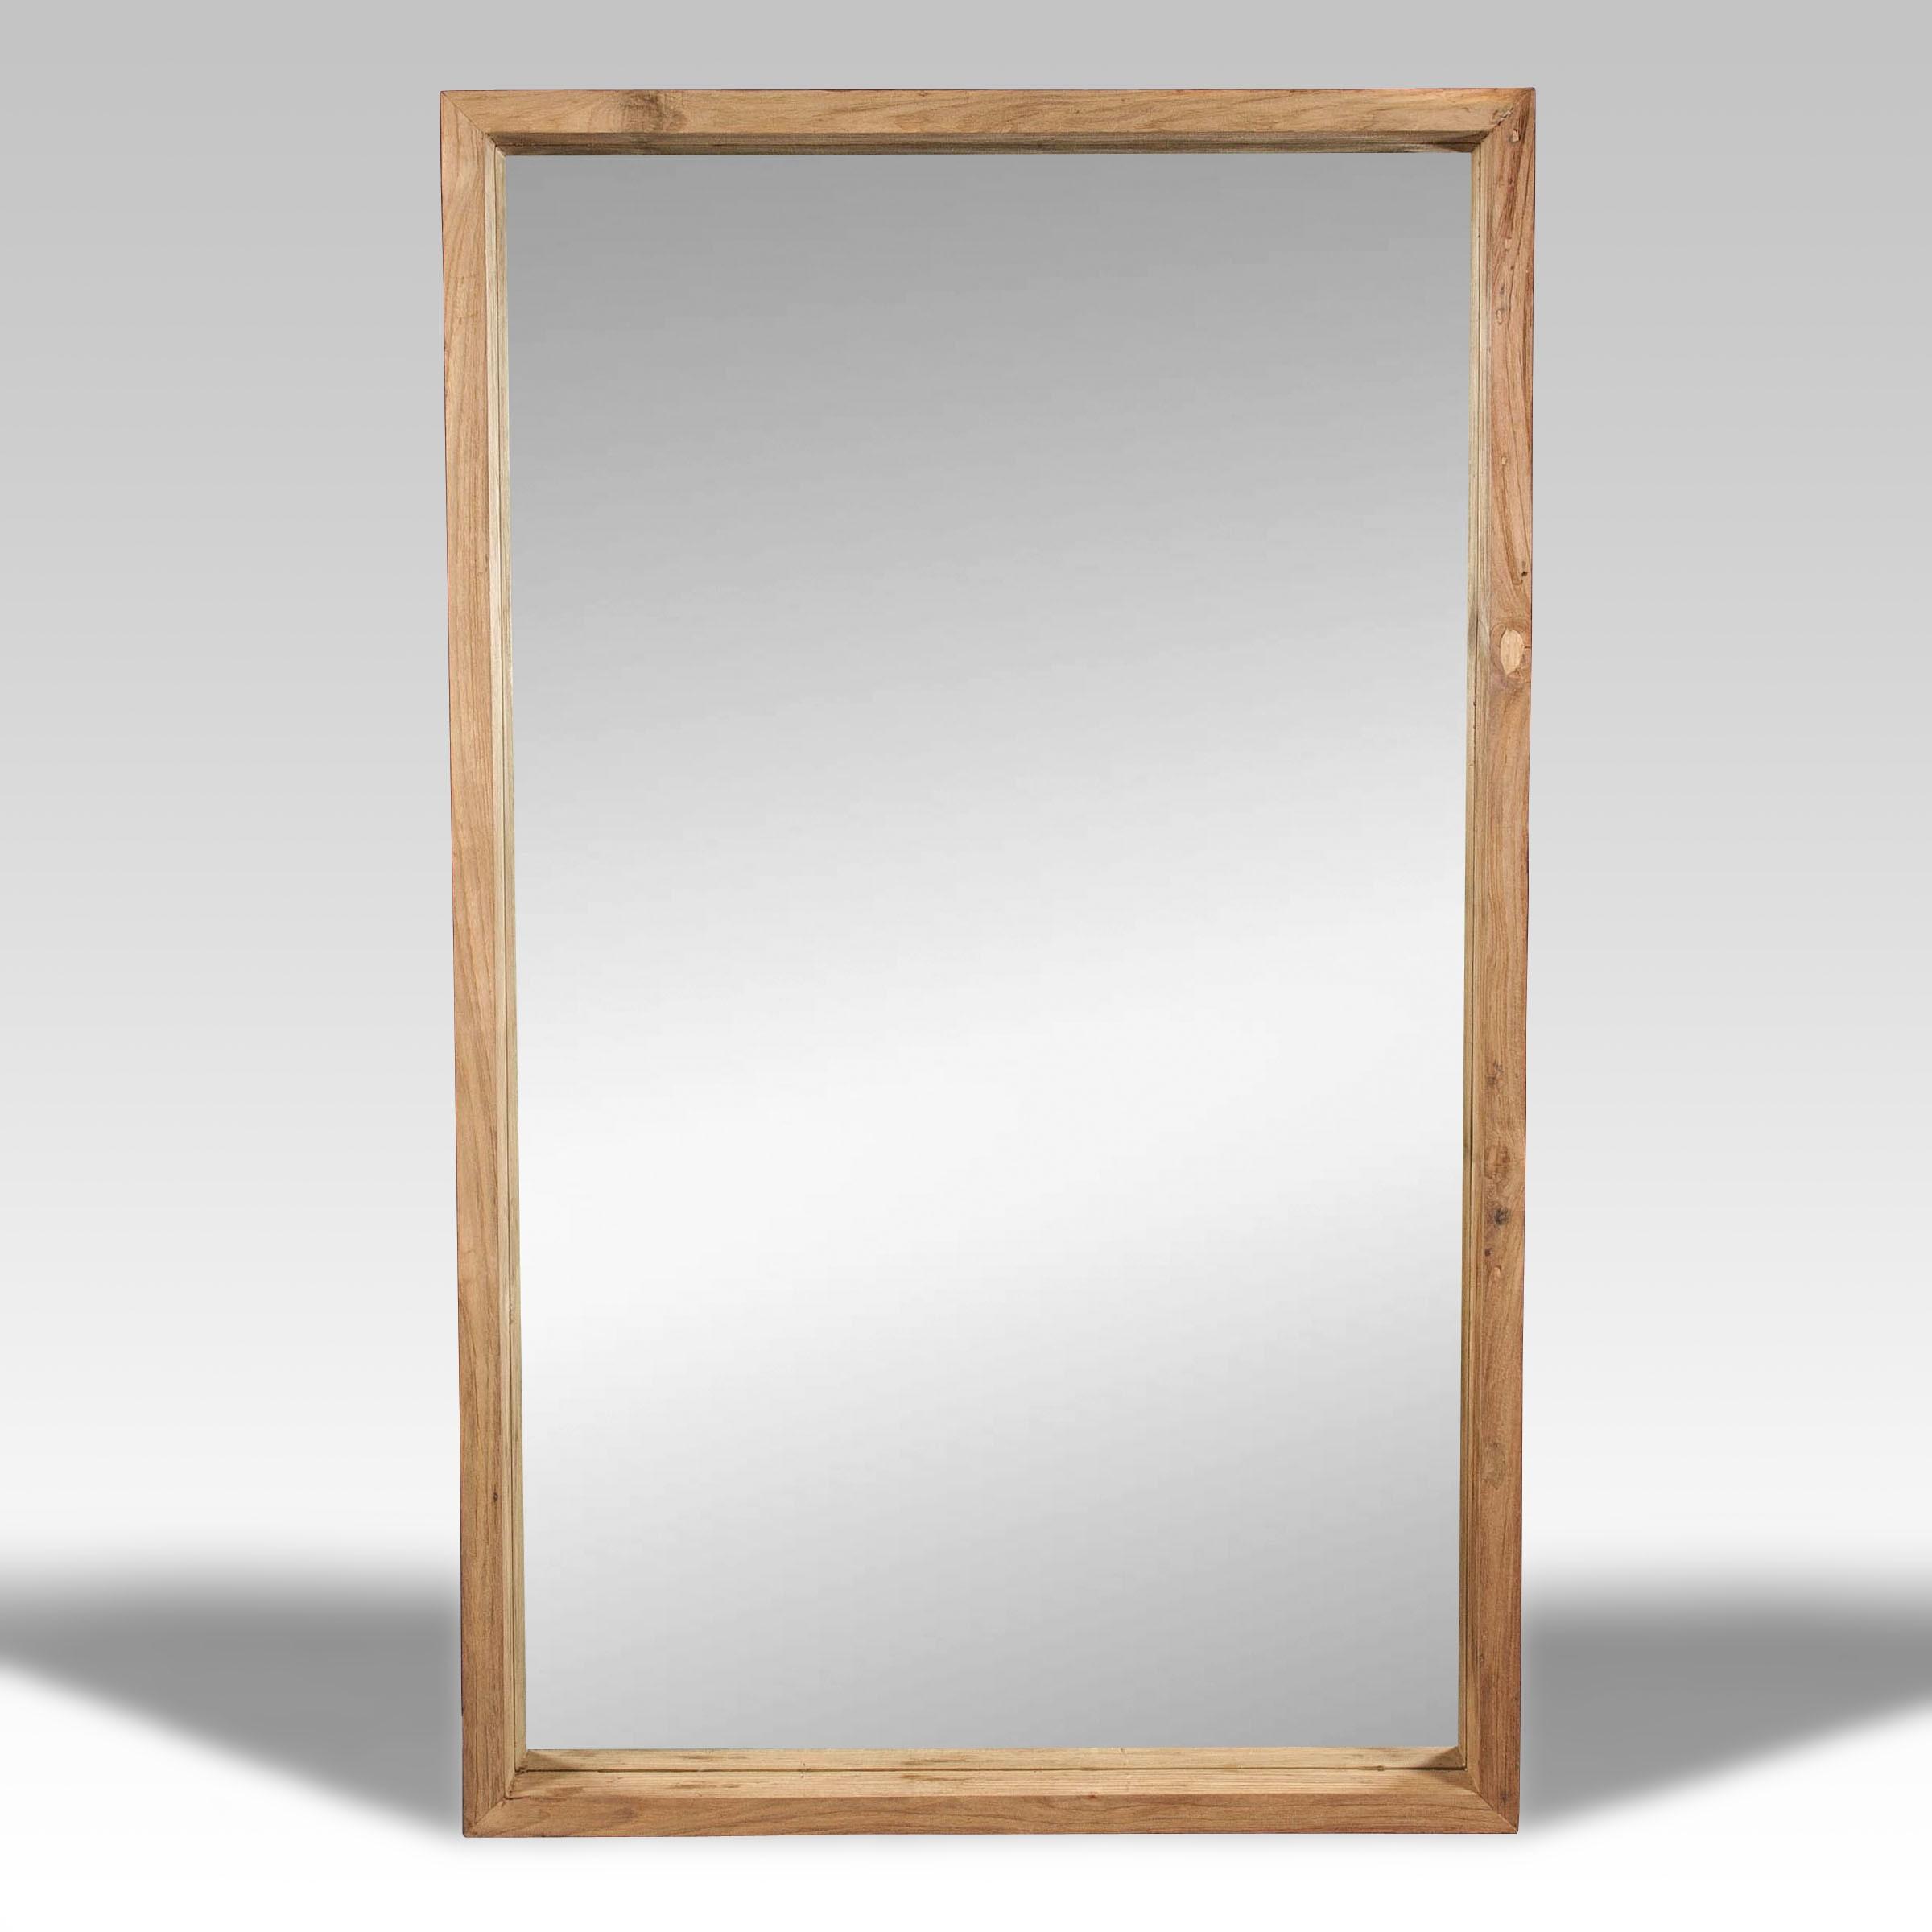 Image gallery imagenes de espejos for Miroir 70 x 50